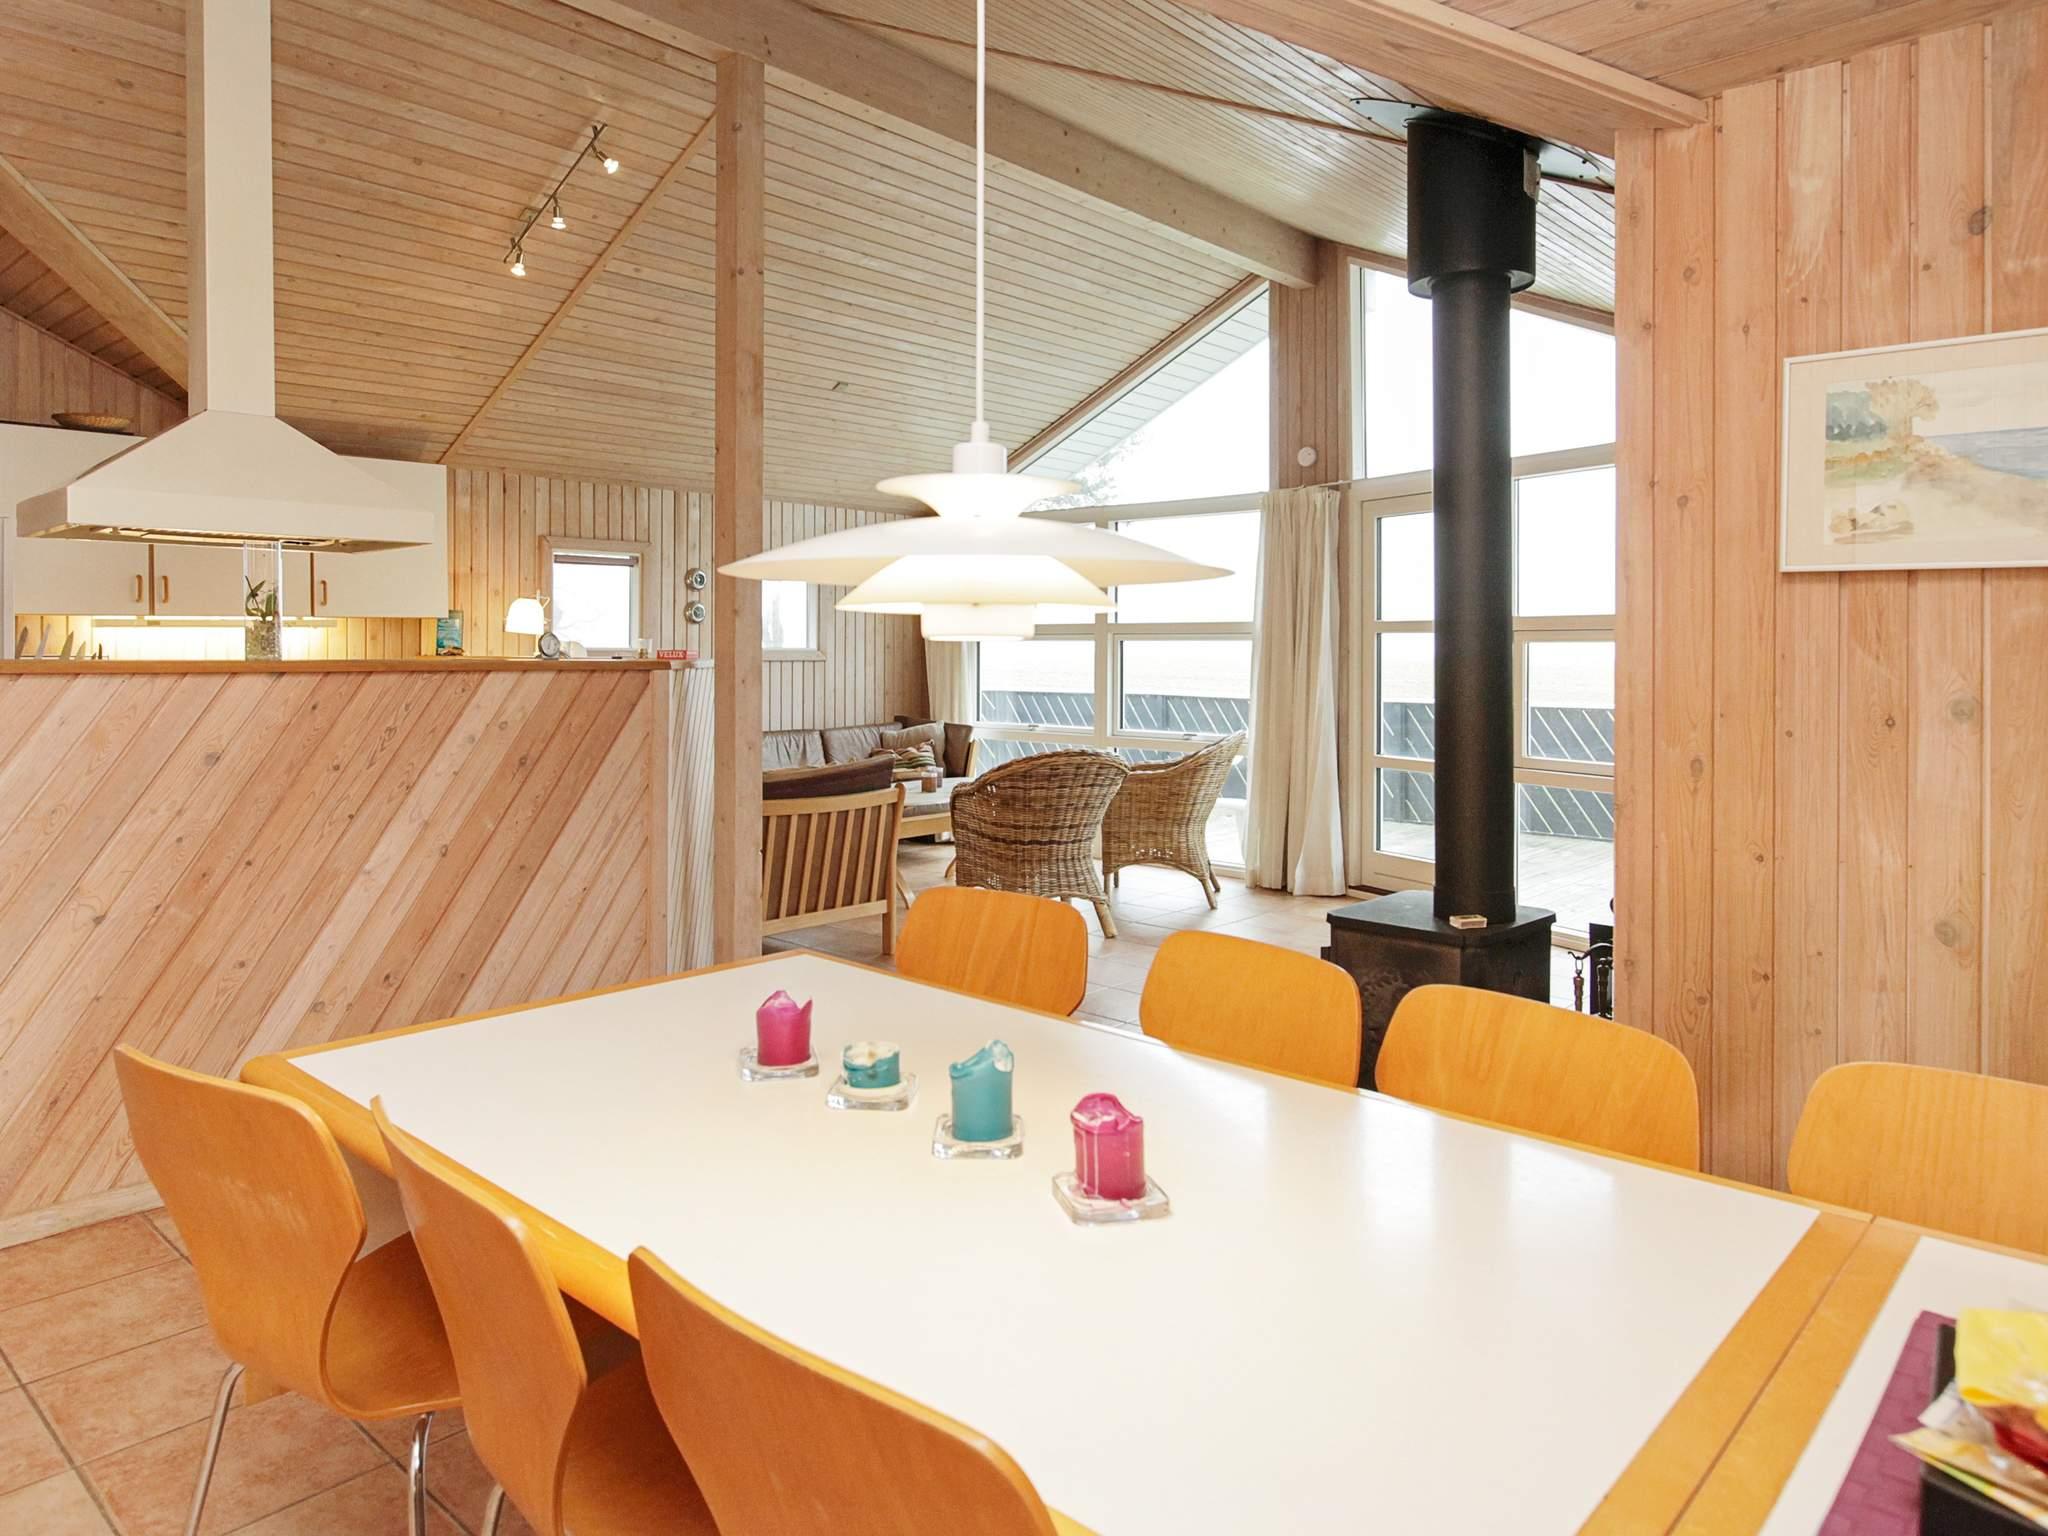 Ferienhaus Fredmosen (596960), Humble, , Langeland, Dänemark, Bild 6